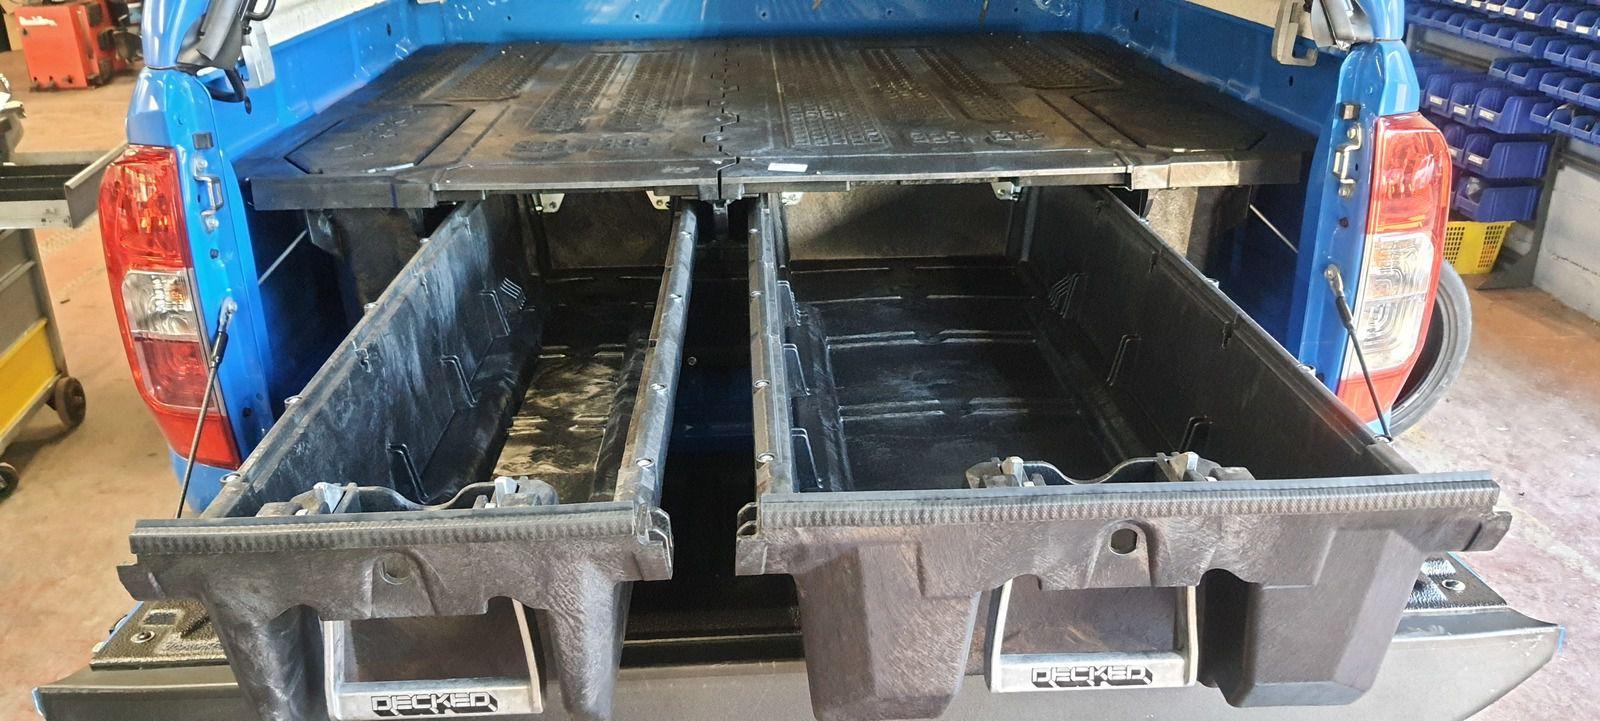 Tiroirs DECKED navara d23 double cab, + galerie hard top + barres de toit